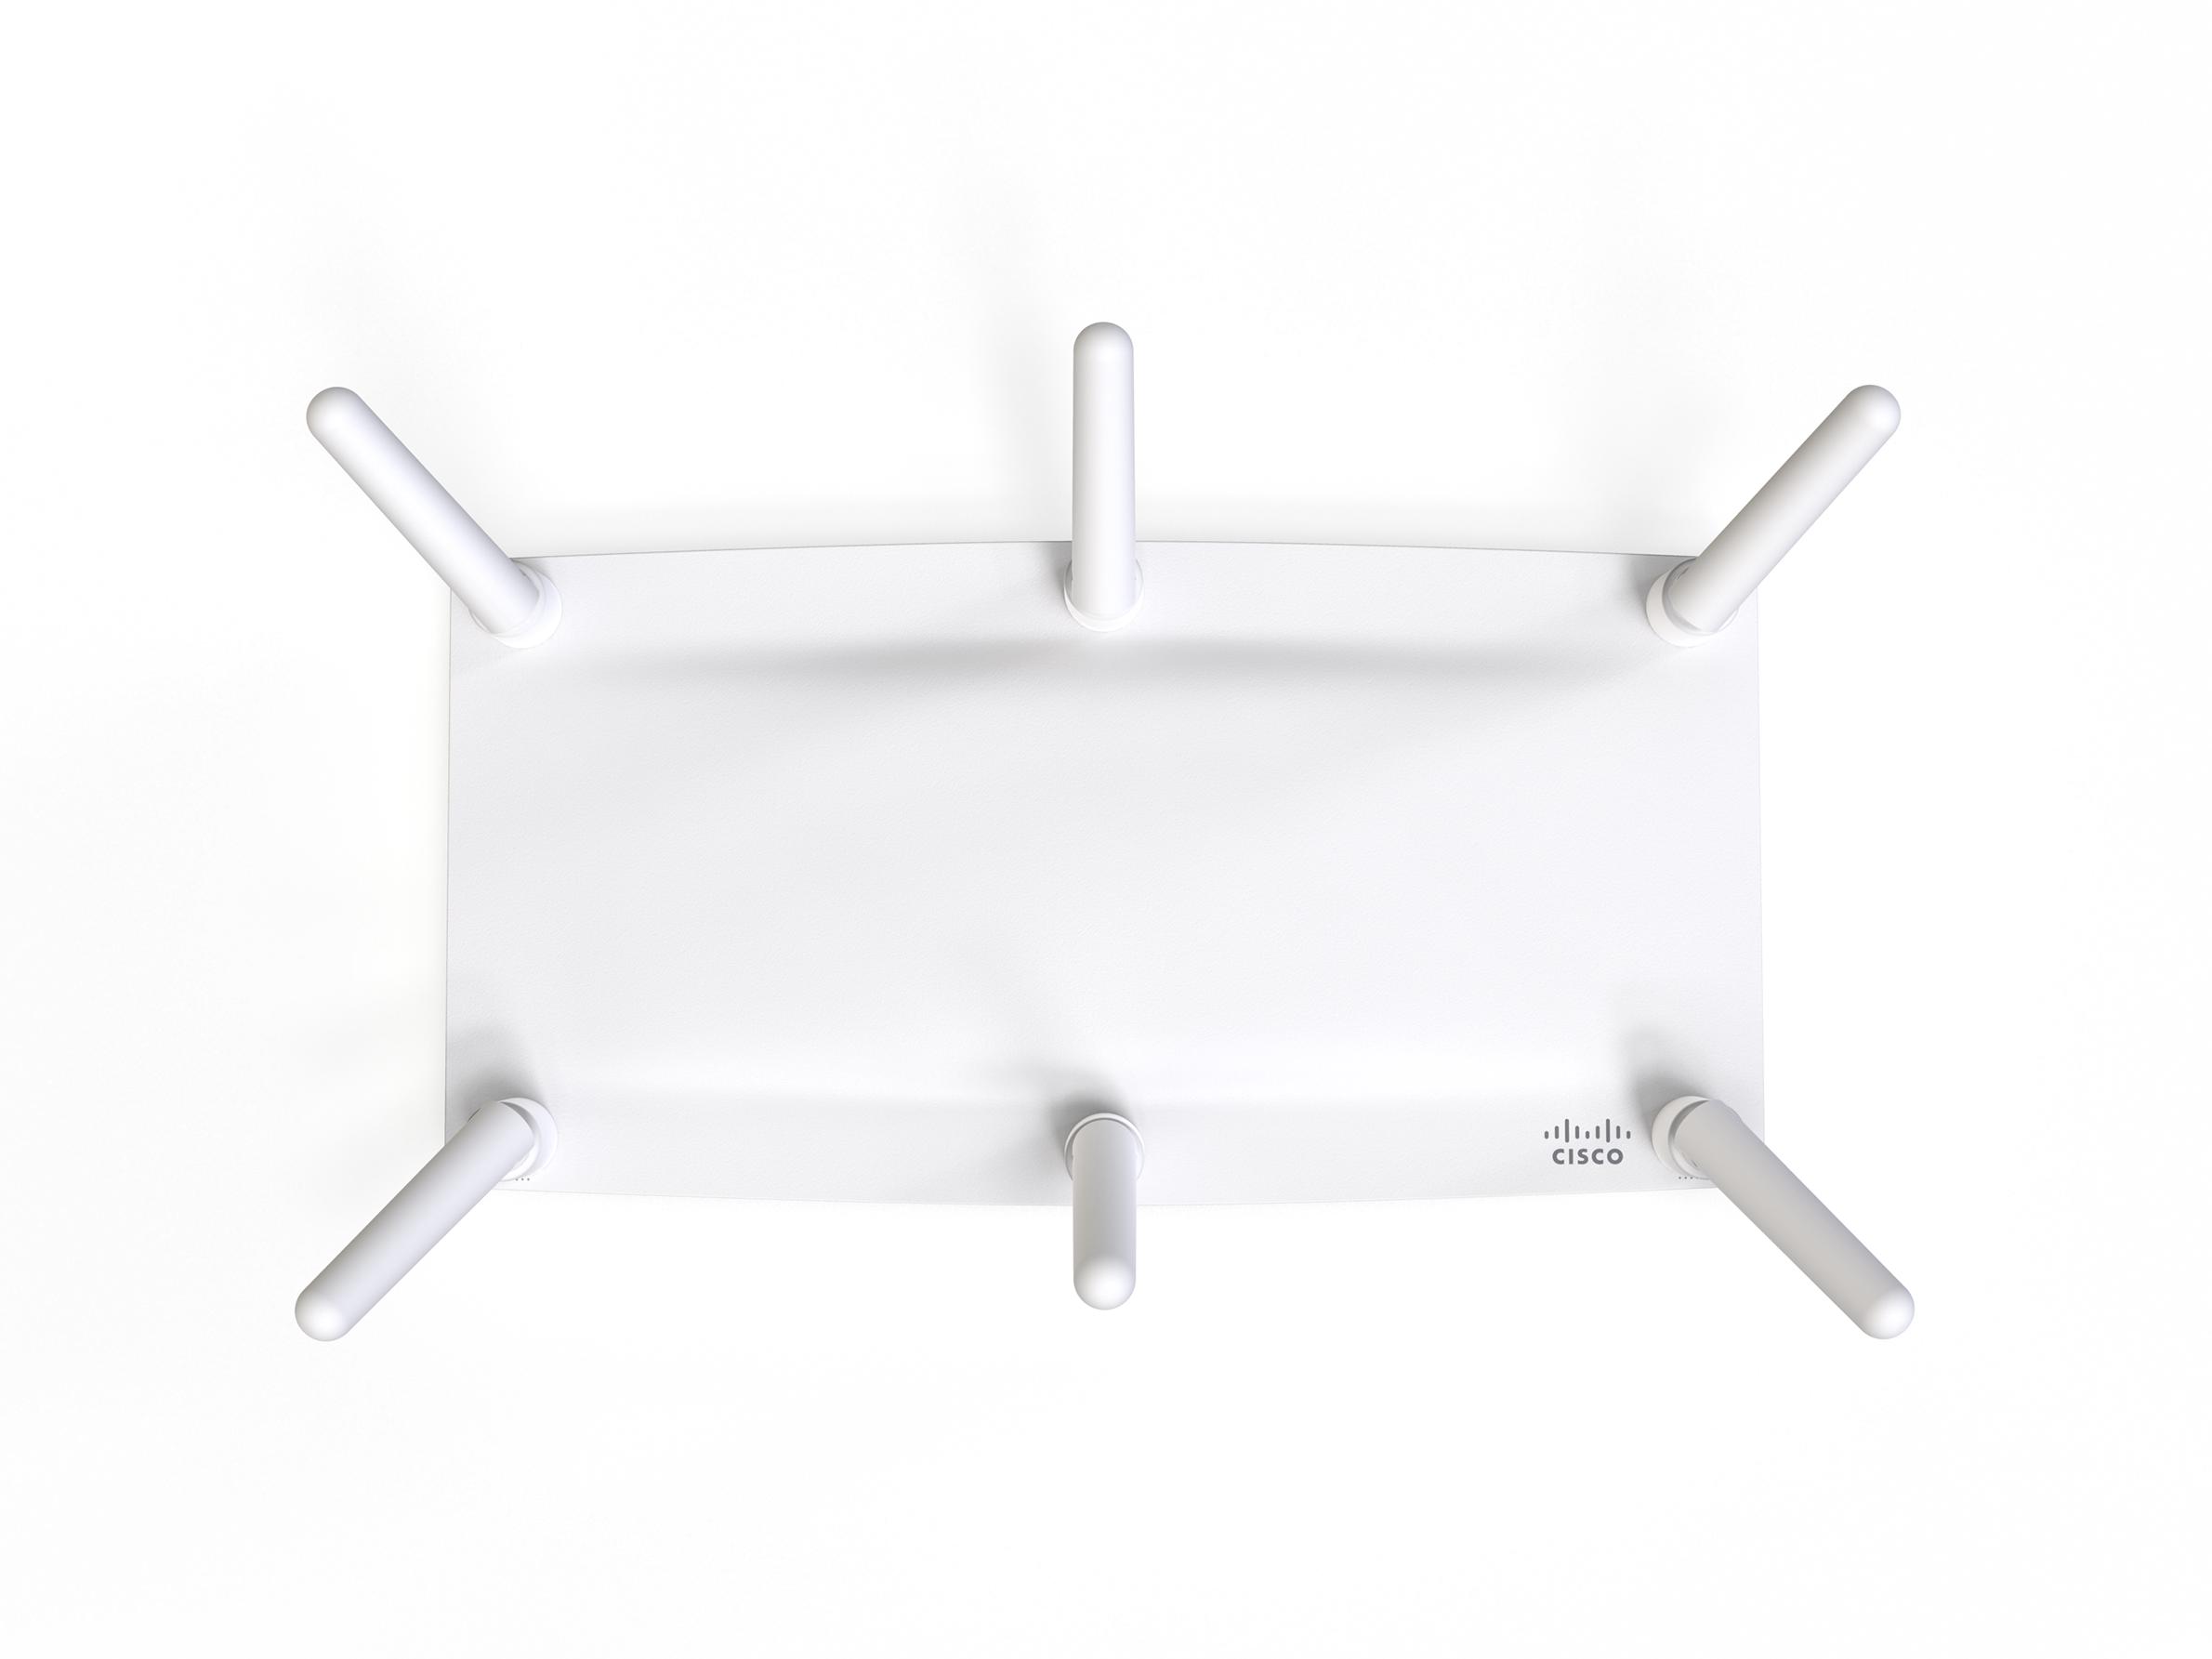 Cisco Meraki MR46E - Wifi 6 Indoor Access Point